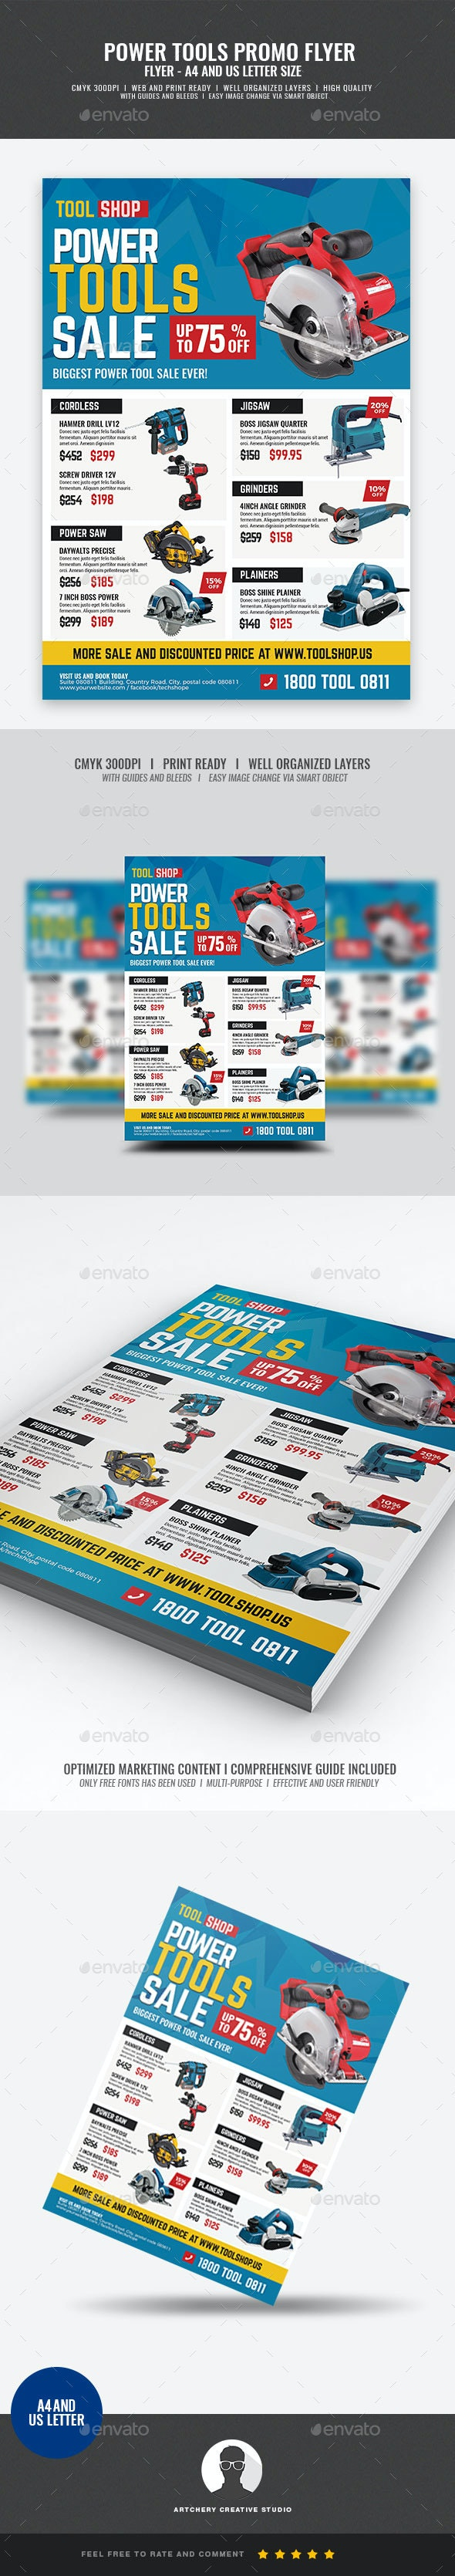 Power Tools Sale Flyer - Commerce Flyers